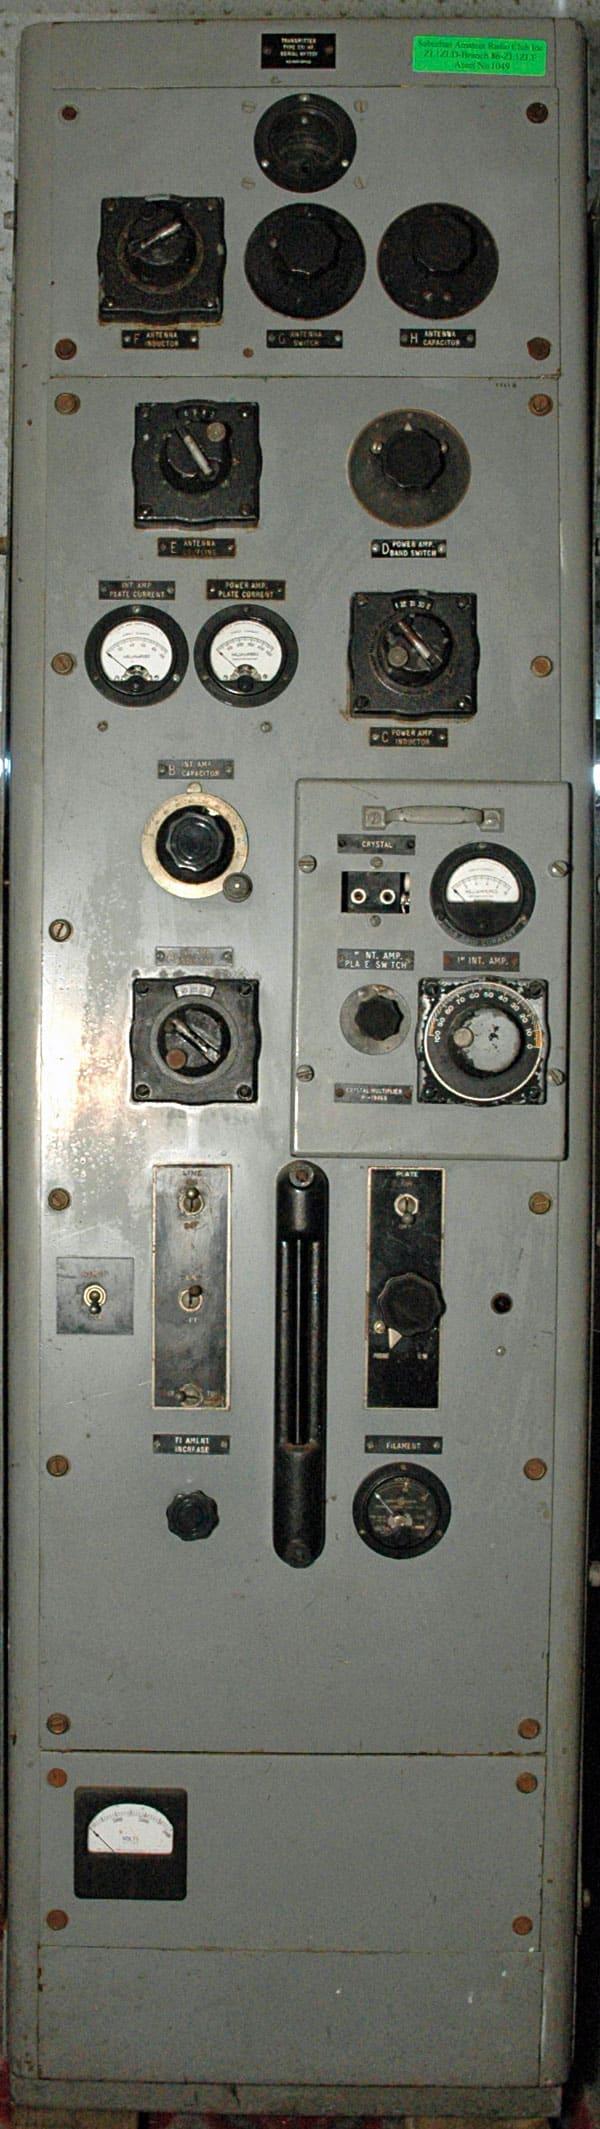 RCA 1301 marine radio transmitter